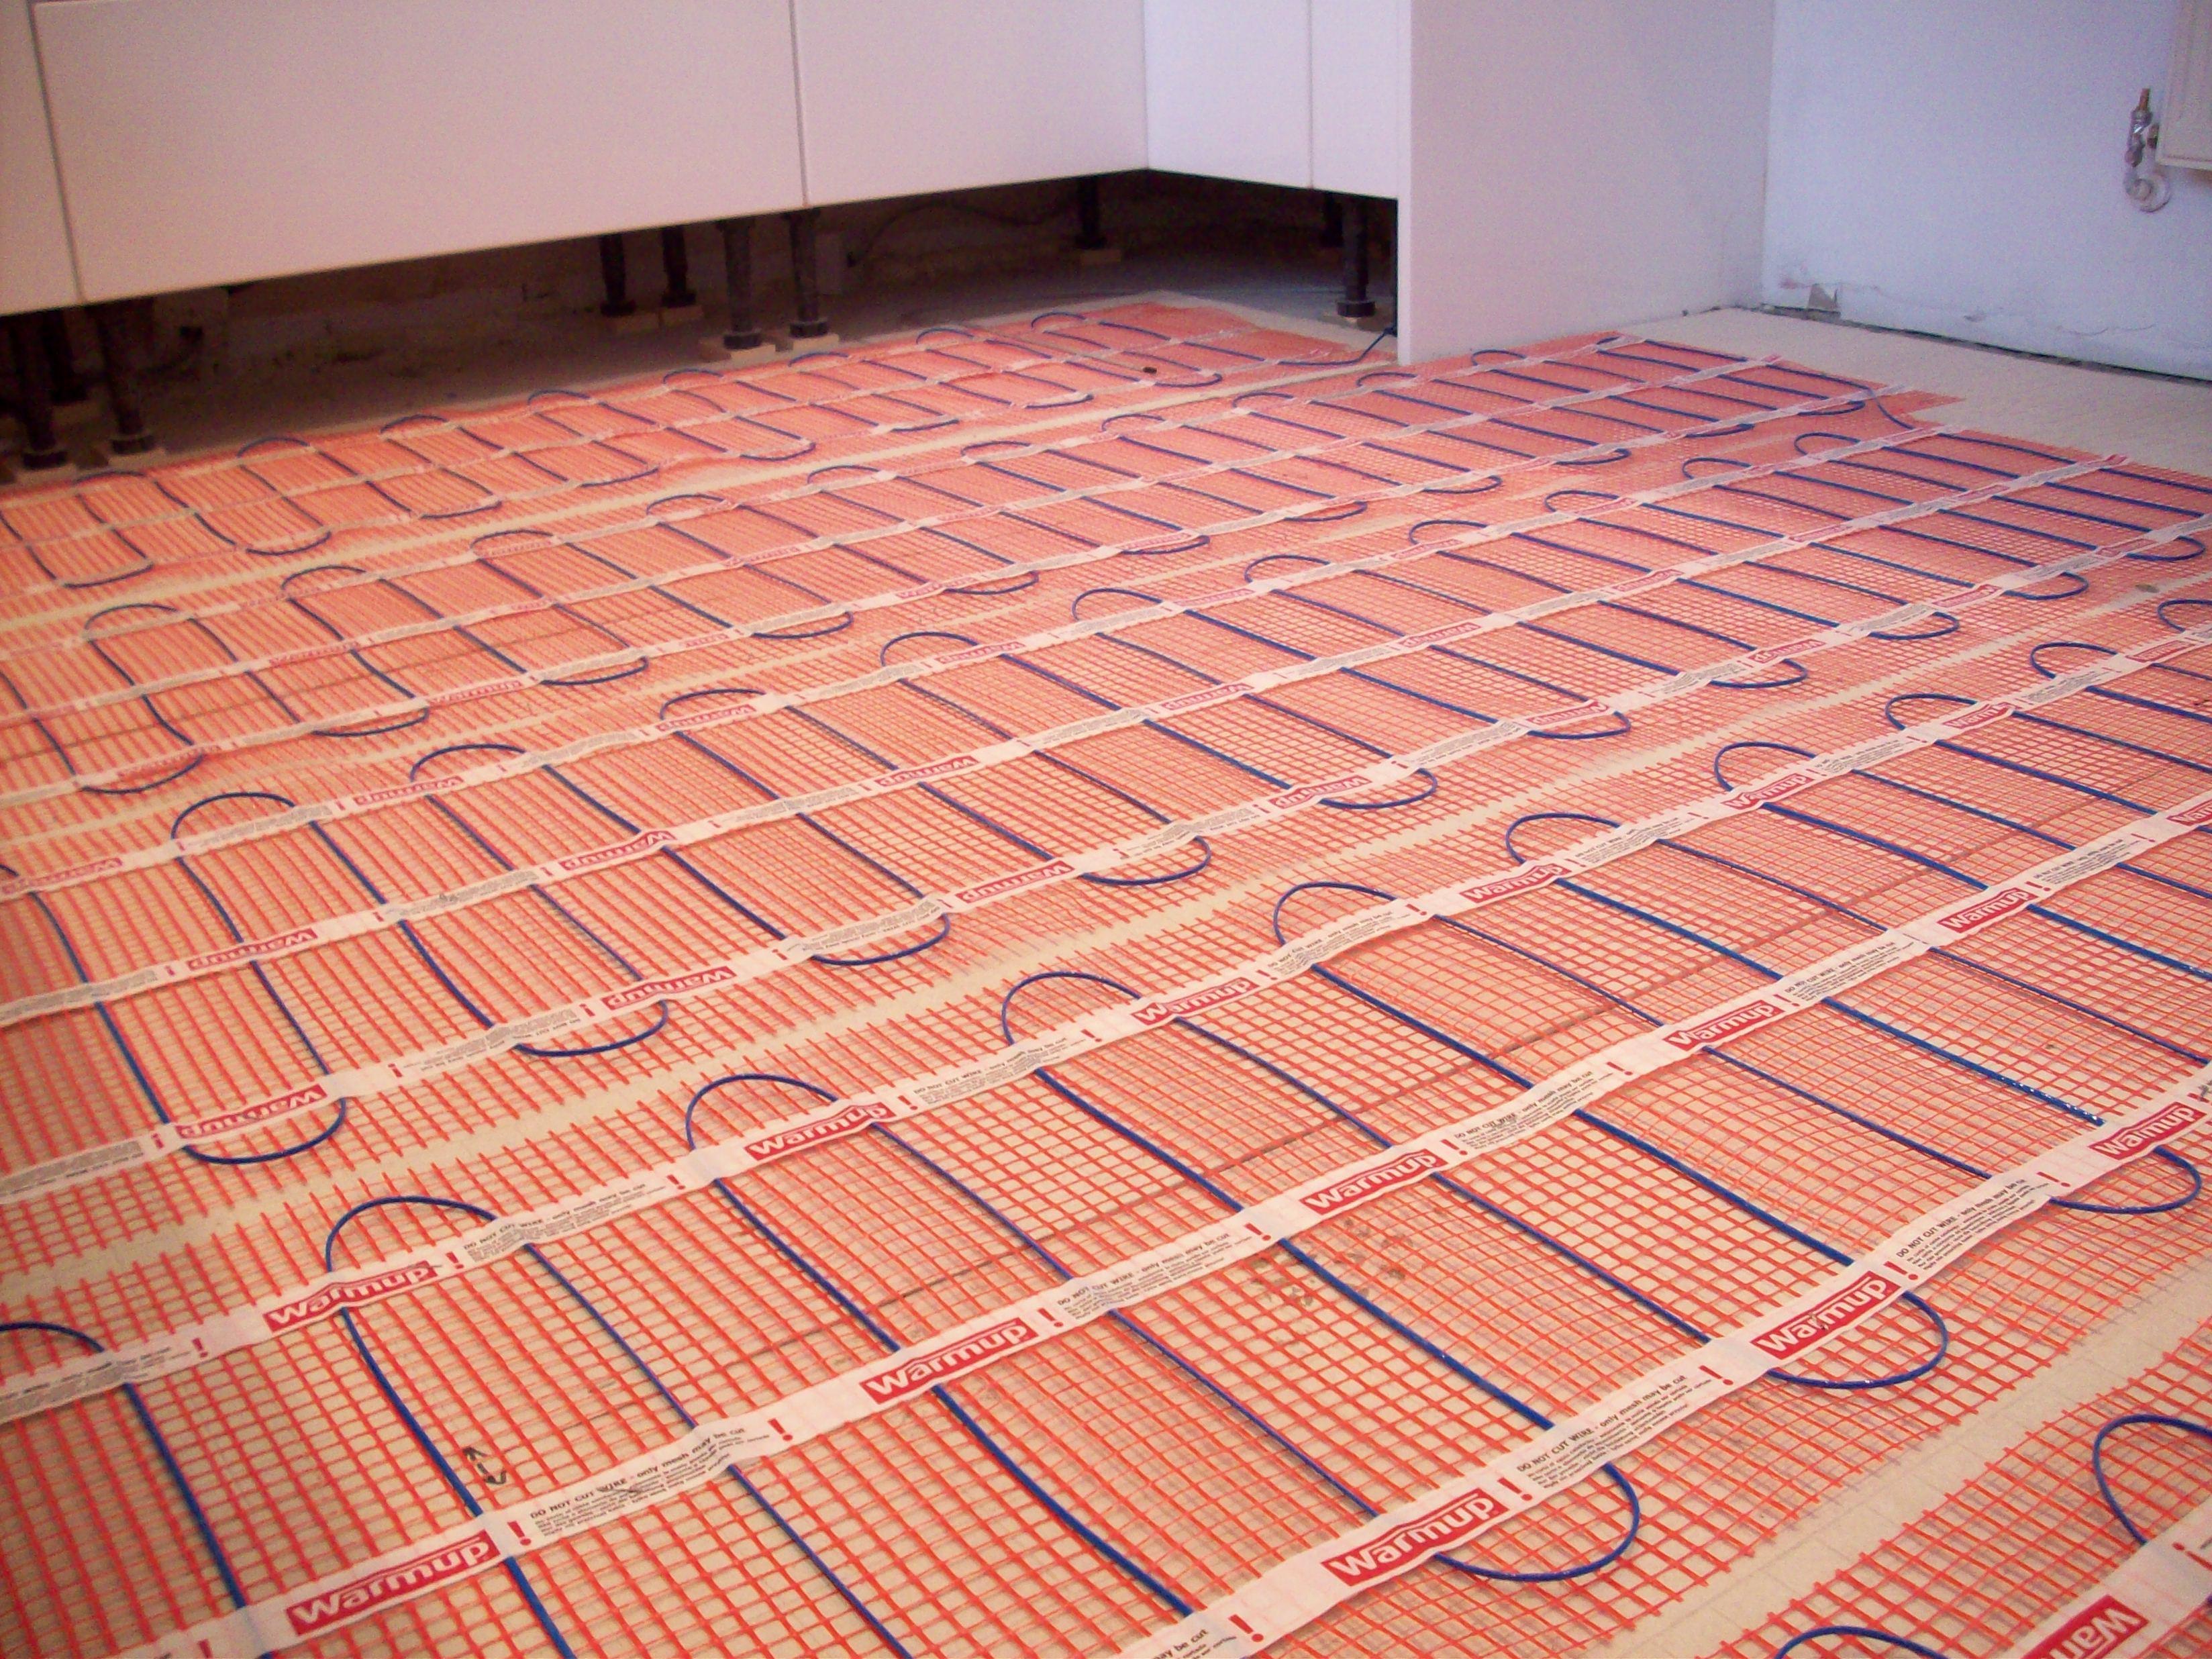 Underfloor Heating Systems Nz Carpet Vidalondon